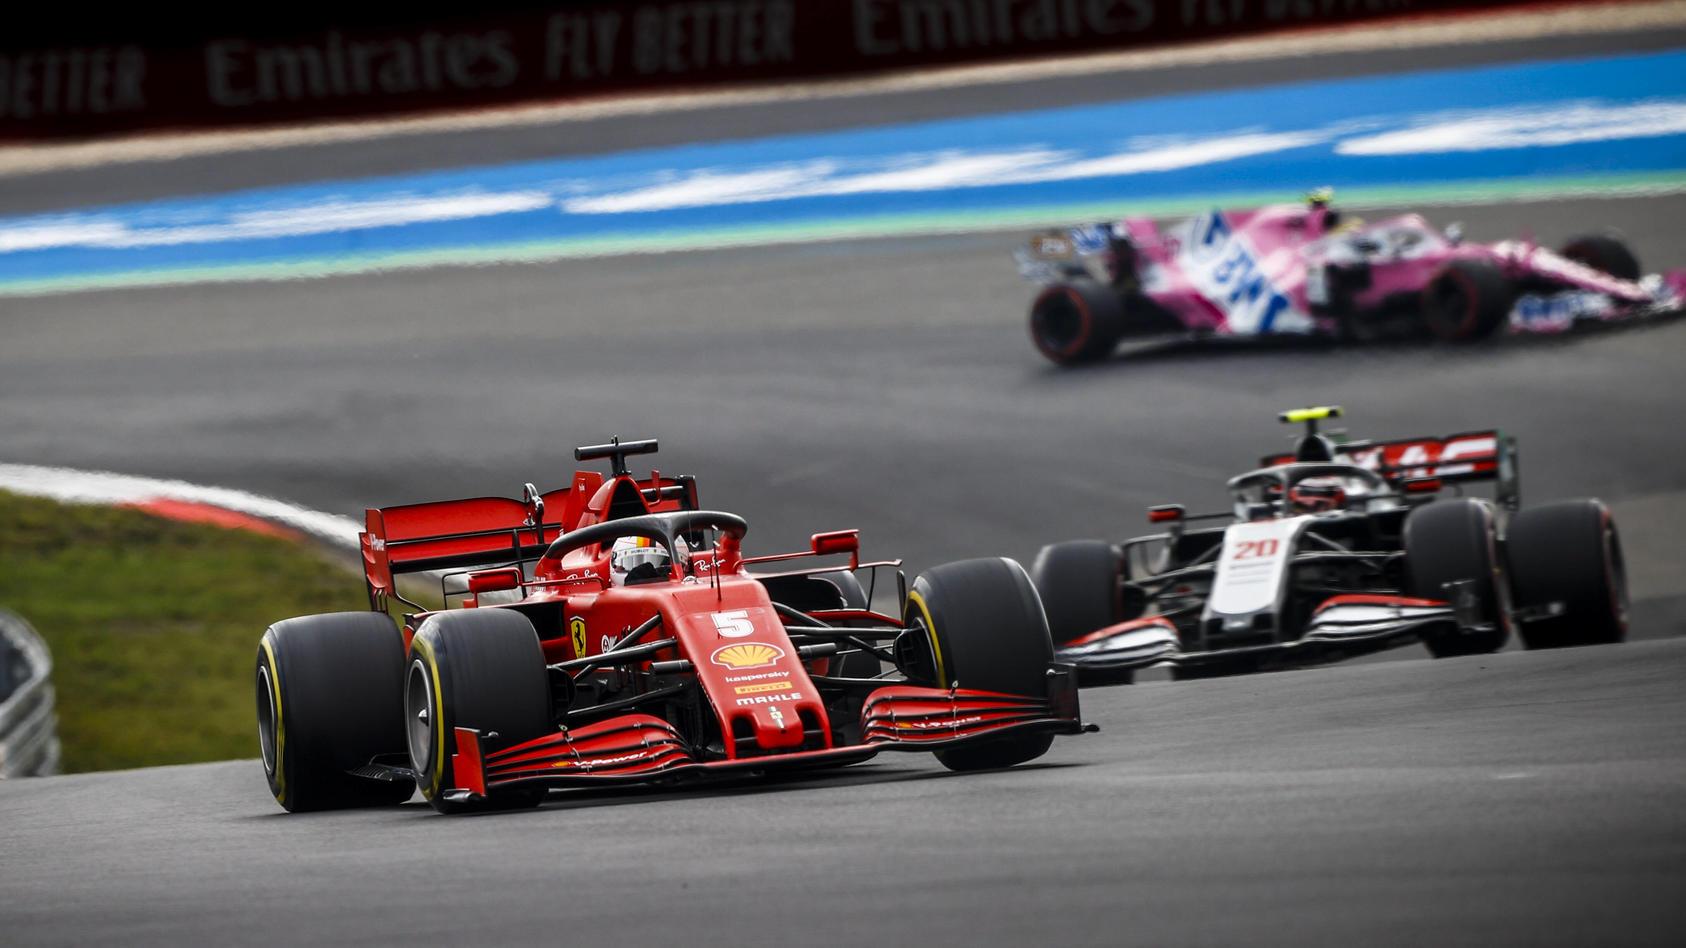 2020 Eifel GP NüRBURGRING, GERMANY - OCTOBER 11: Sebastian Vettel, Ferrari SF1000, leads Kevin Magnussen, Haas VF-20 du